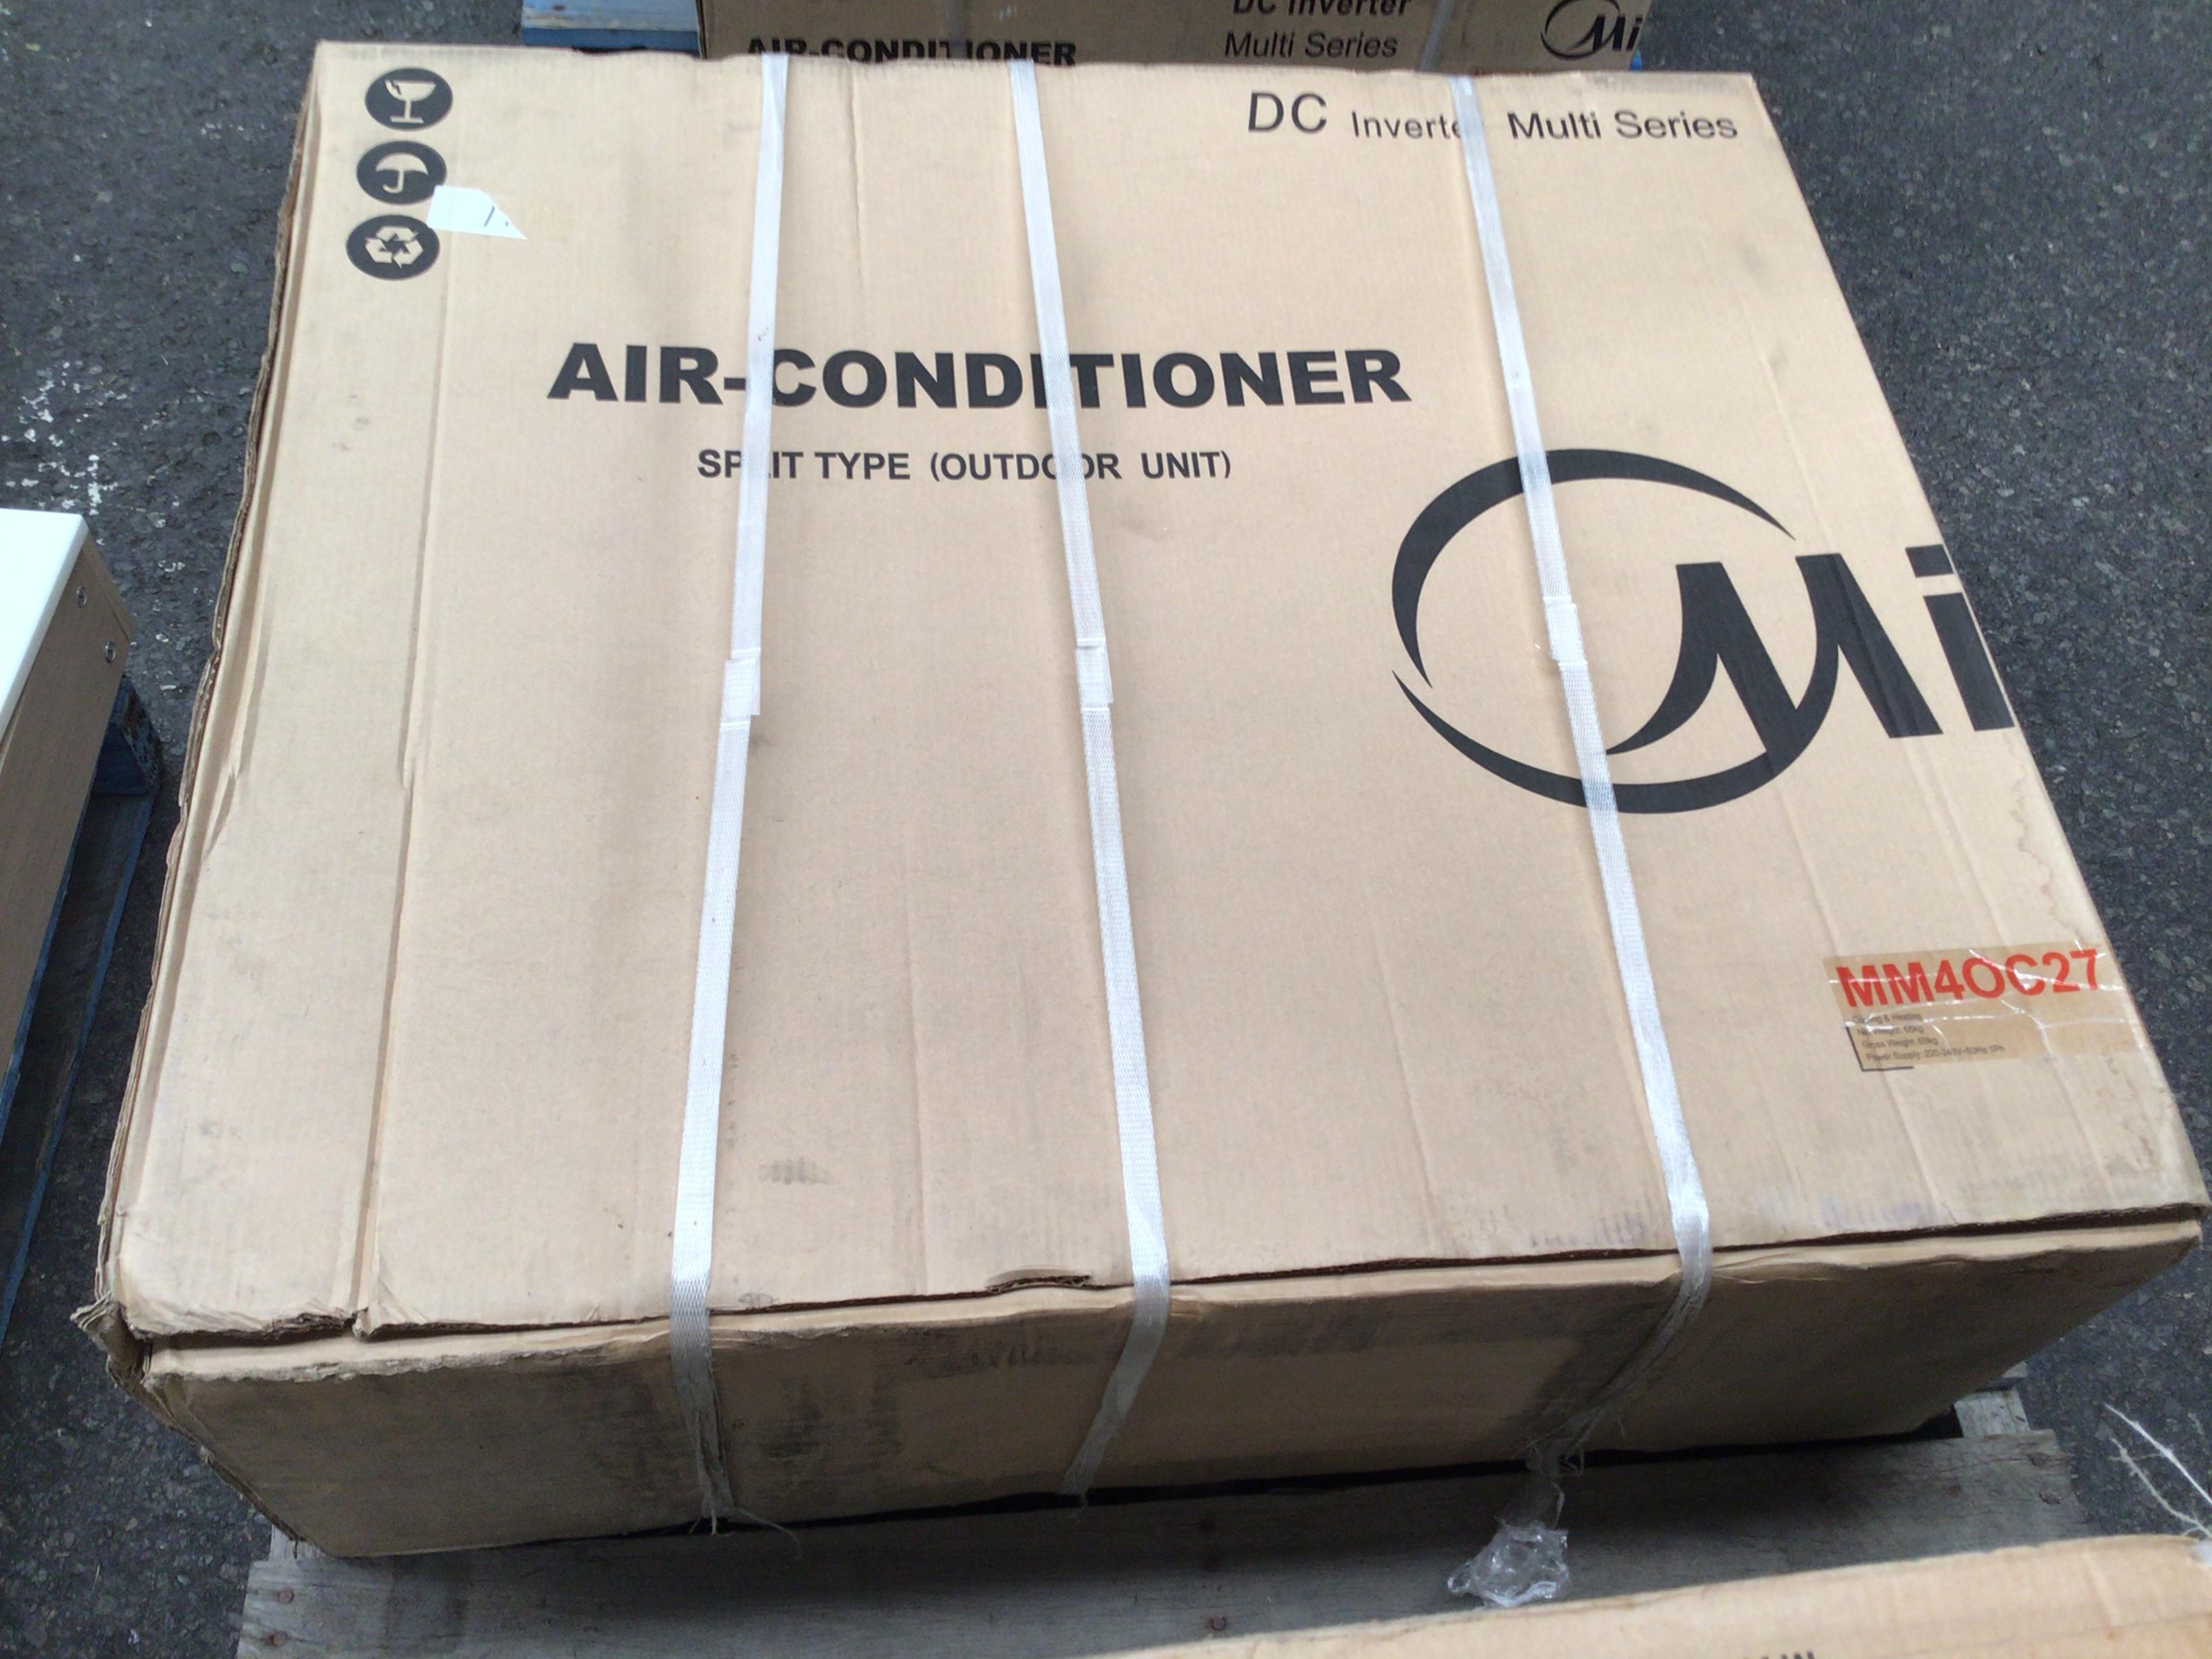 Midea MM40C27 multi-head air conditioning system.